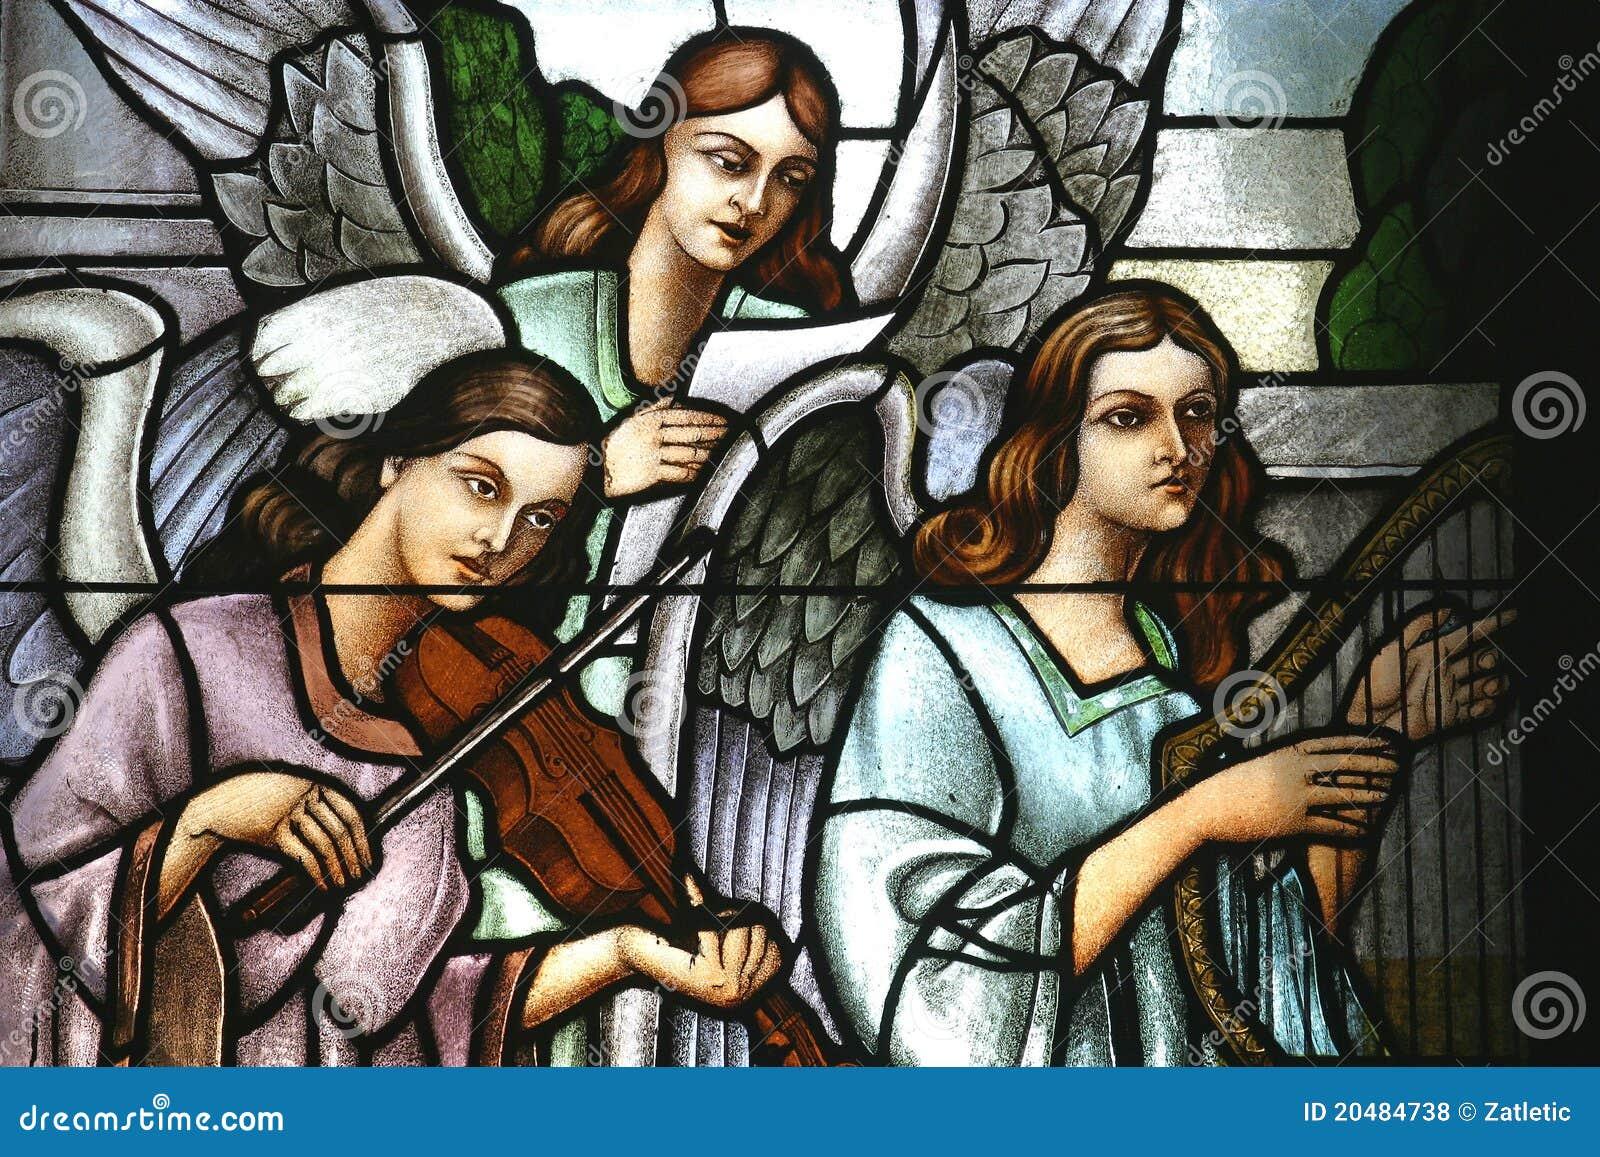 Musician angels